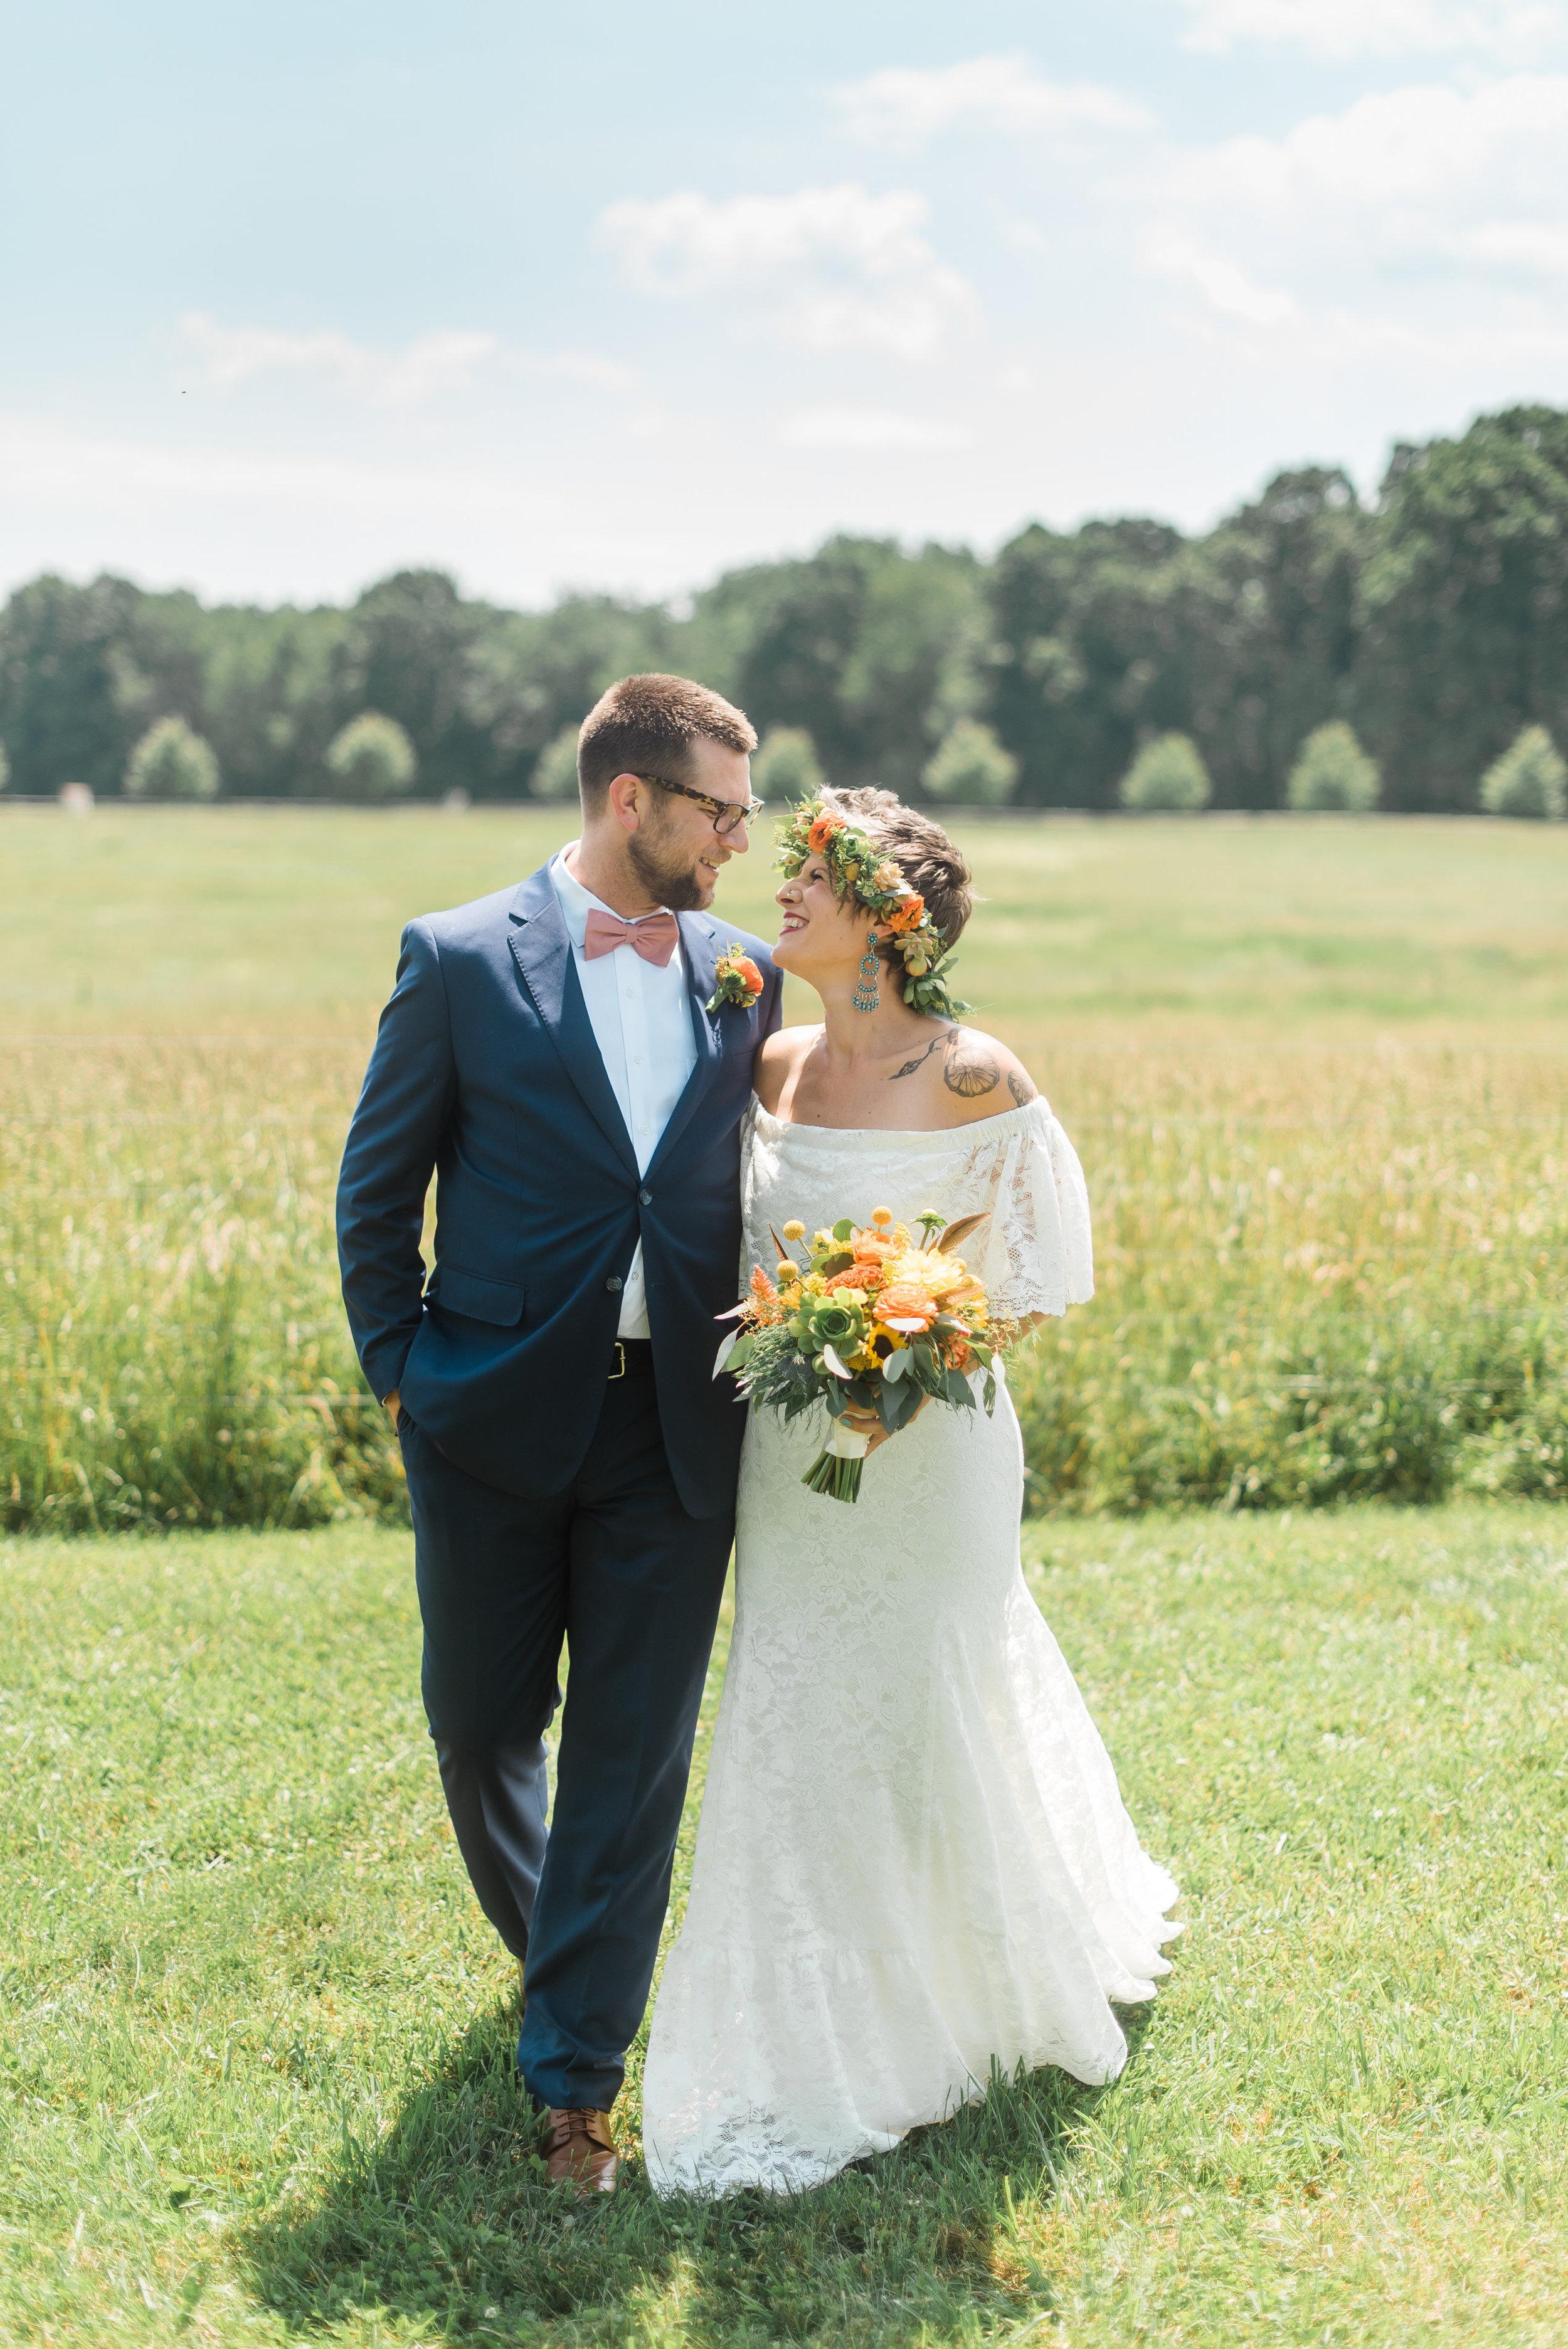 pittsburgh-wedding-photographer-armstrongfarms-eclectic-offbeat-boho0142.jpg